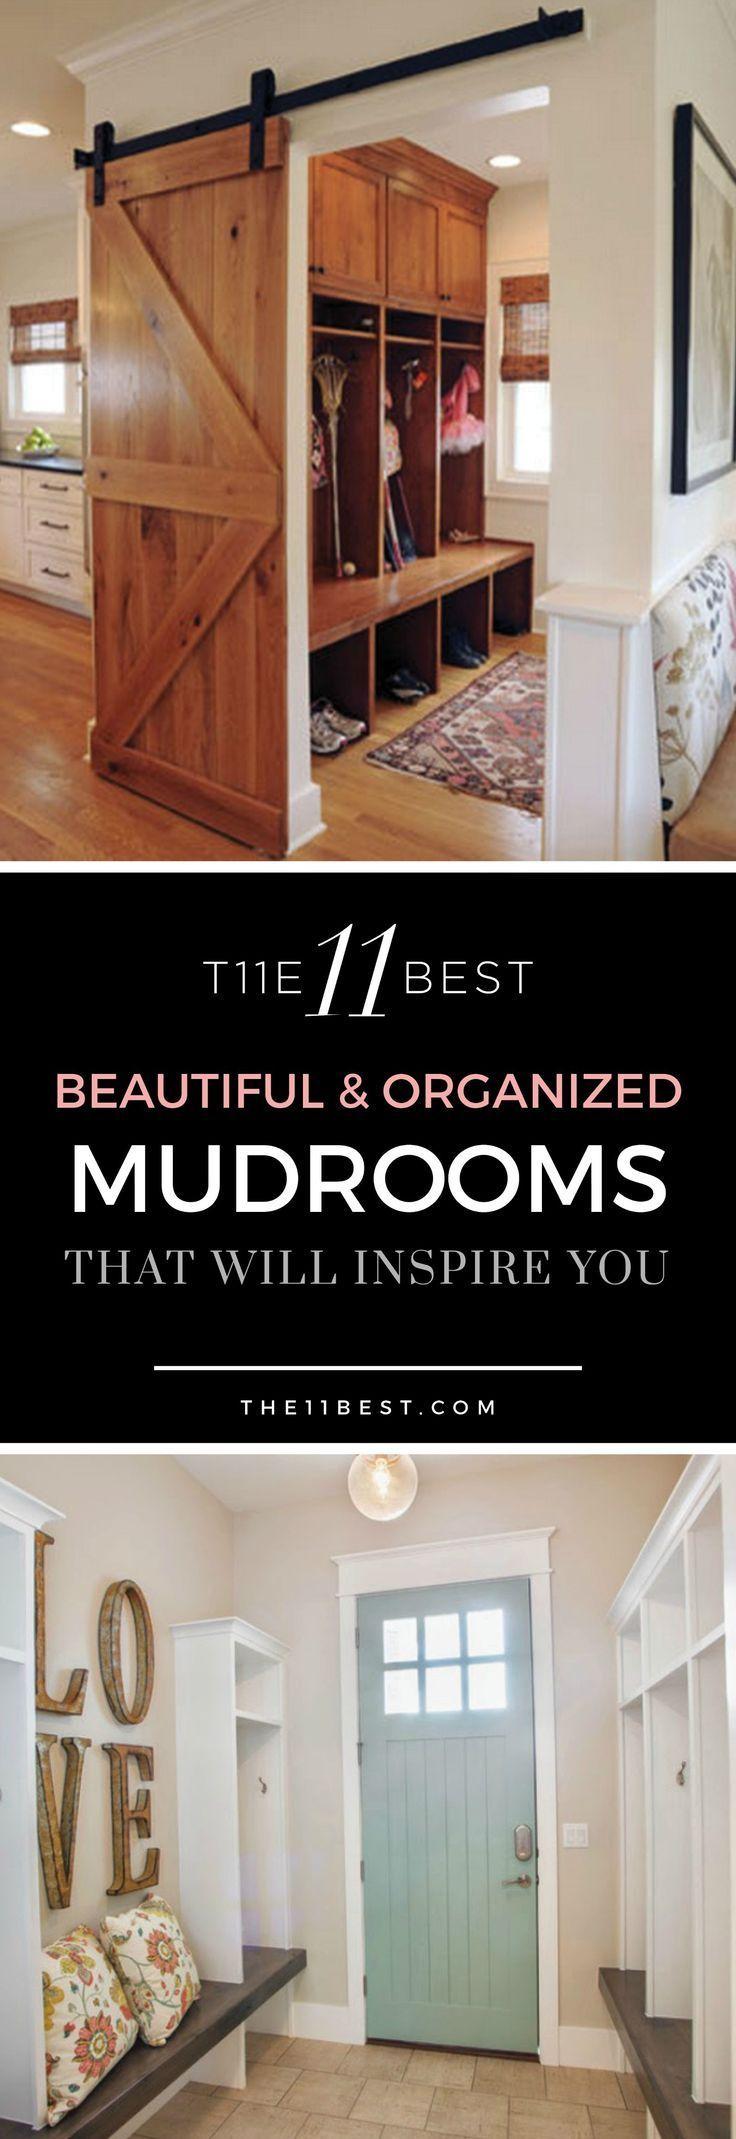 Beautiful And Organized Mudroom Ideas